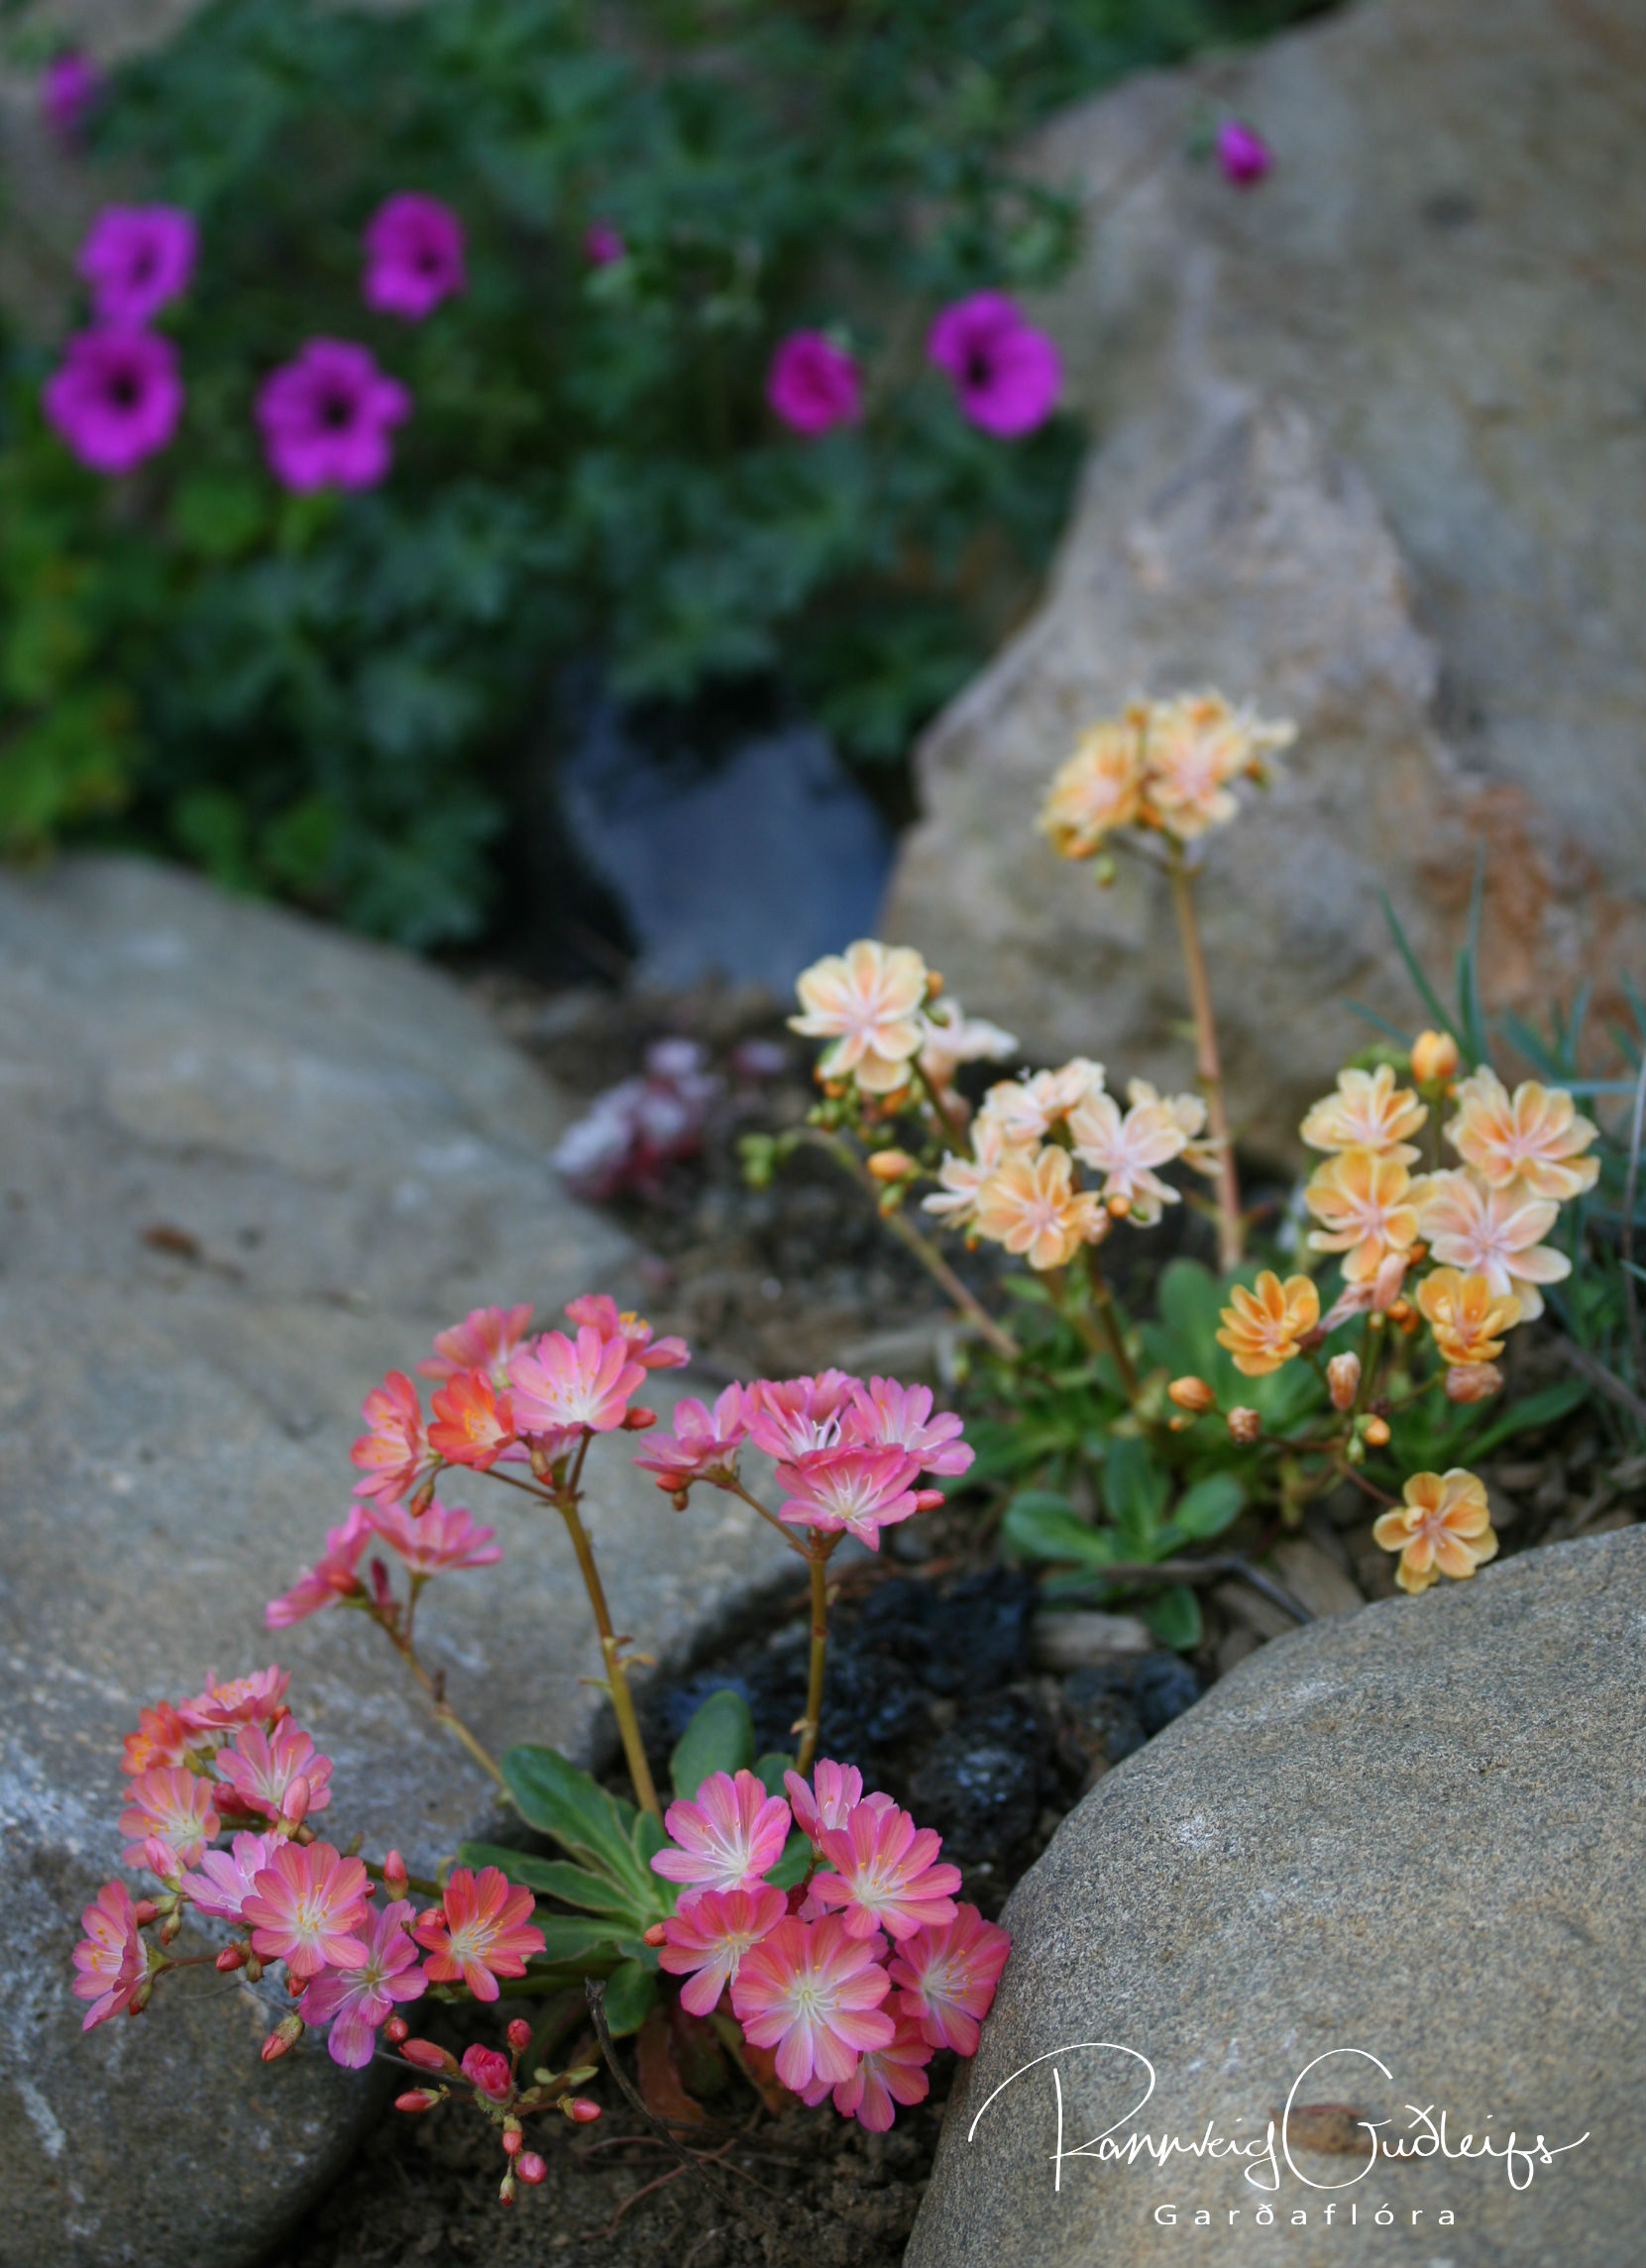 Lewisia cotyledon 'Pink-Orange'